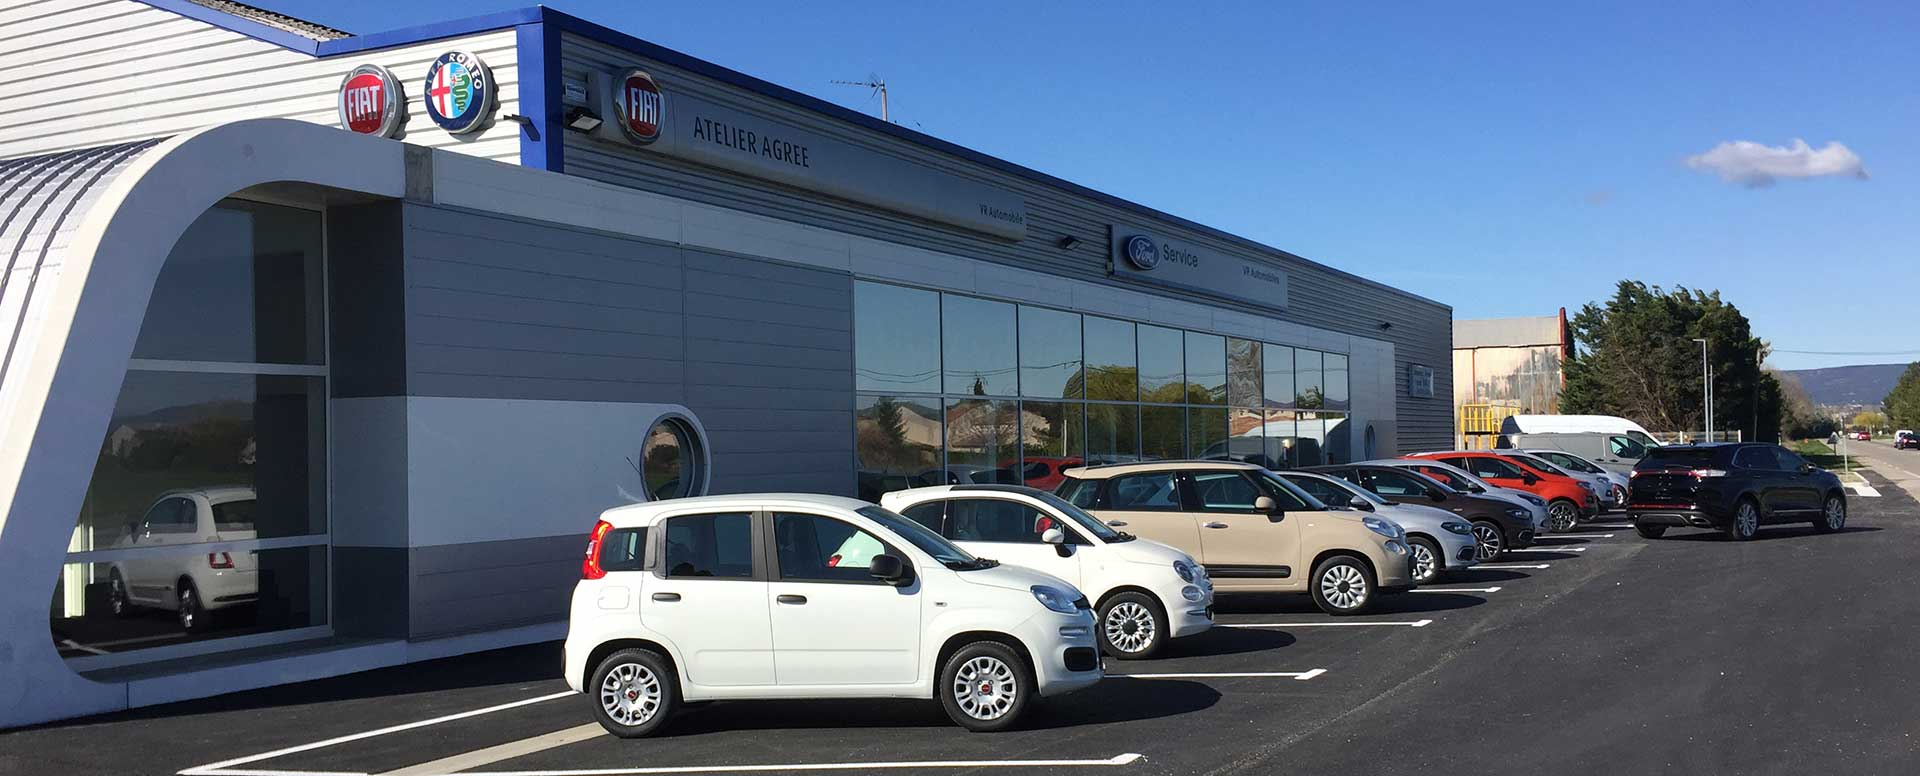 Contactez v r automobile garage ford et fiat pierrelatte for Garage ford st maur des fosses